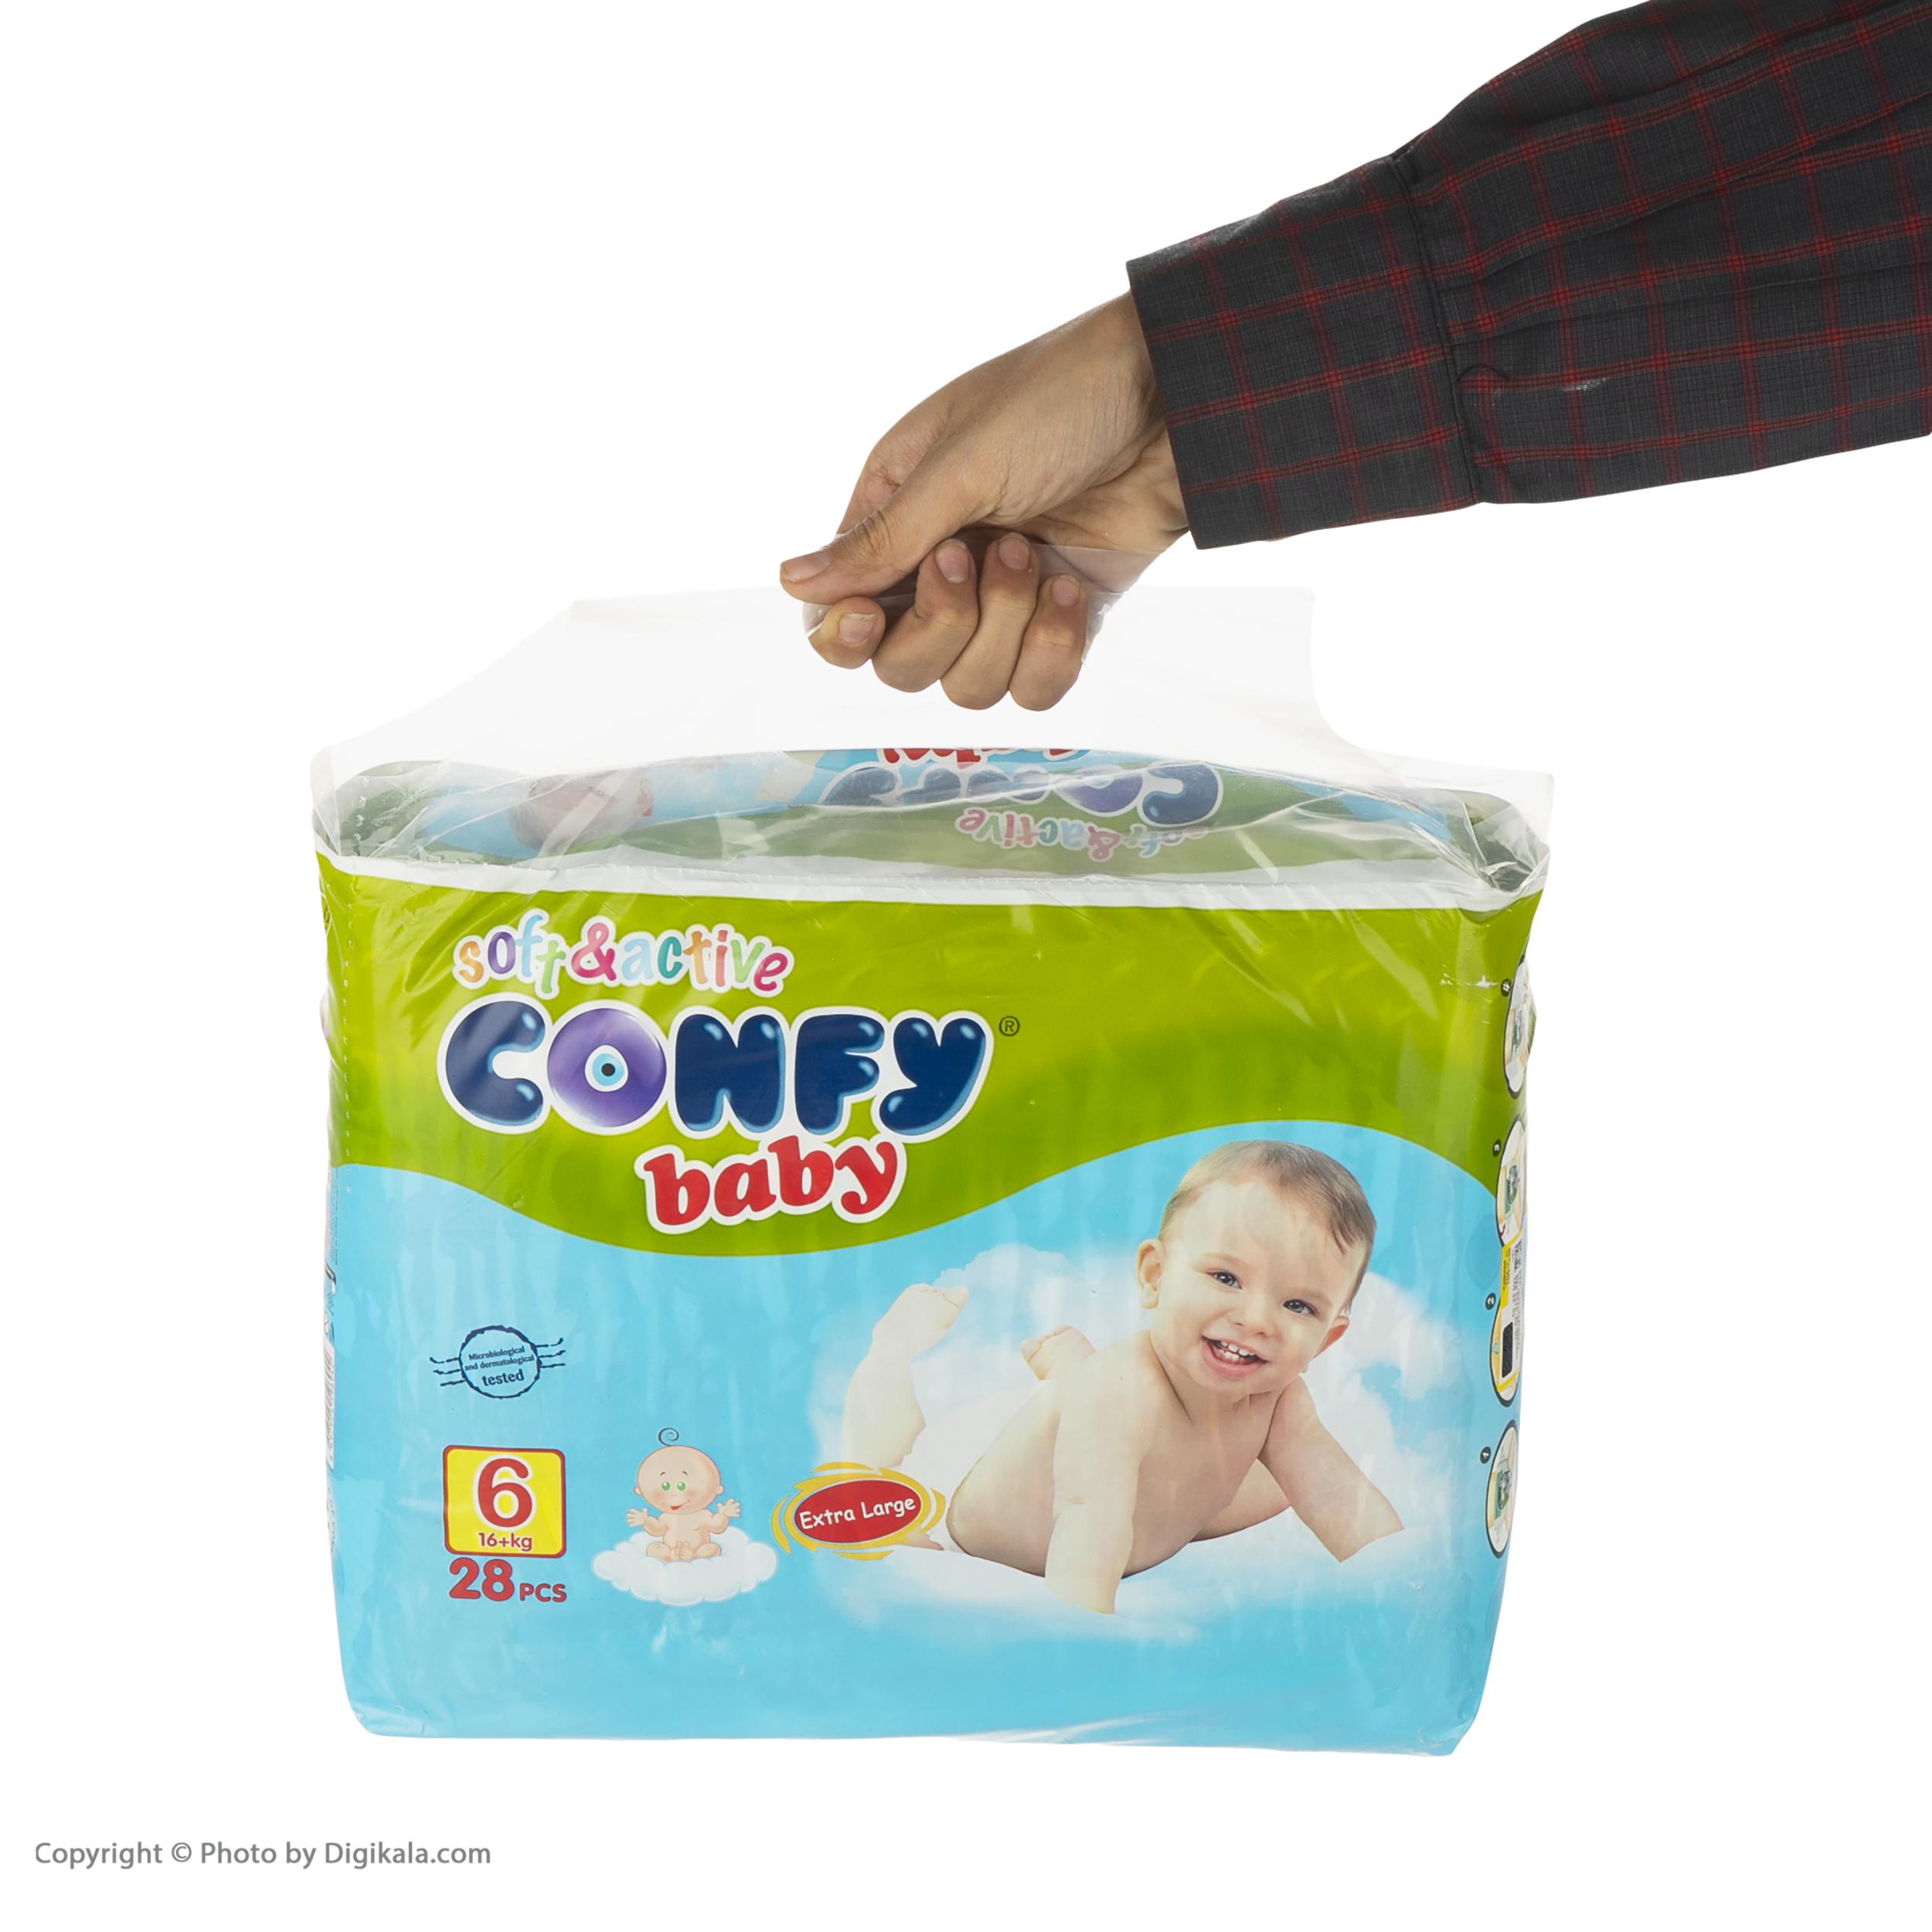 پوشک بچه کانفی کد 01 سایز 6 بسته 28 عددی main 1 3